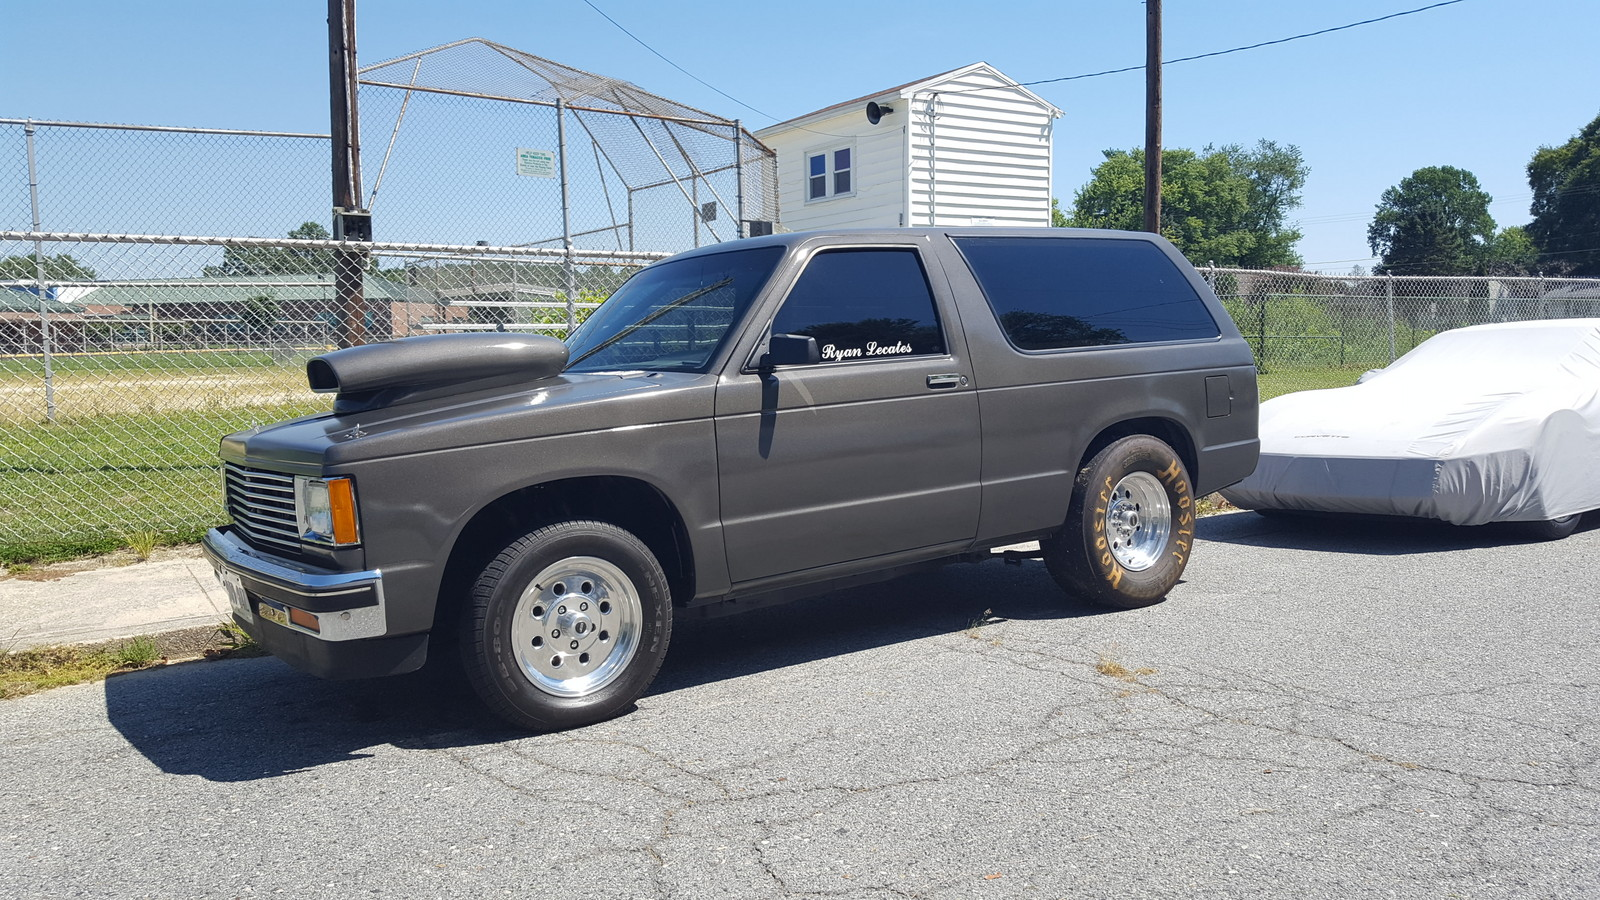 1 4 Mile Times >> 1988 Chevrolet S10 Blazer 1/4 mile Drag Racing timeslip specs 0-60 - DragTimes.com